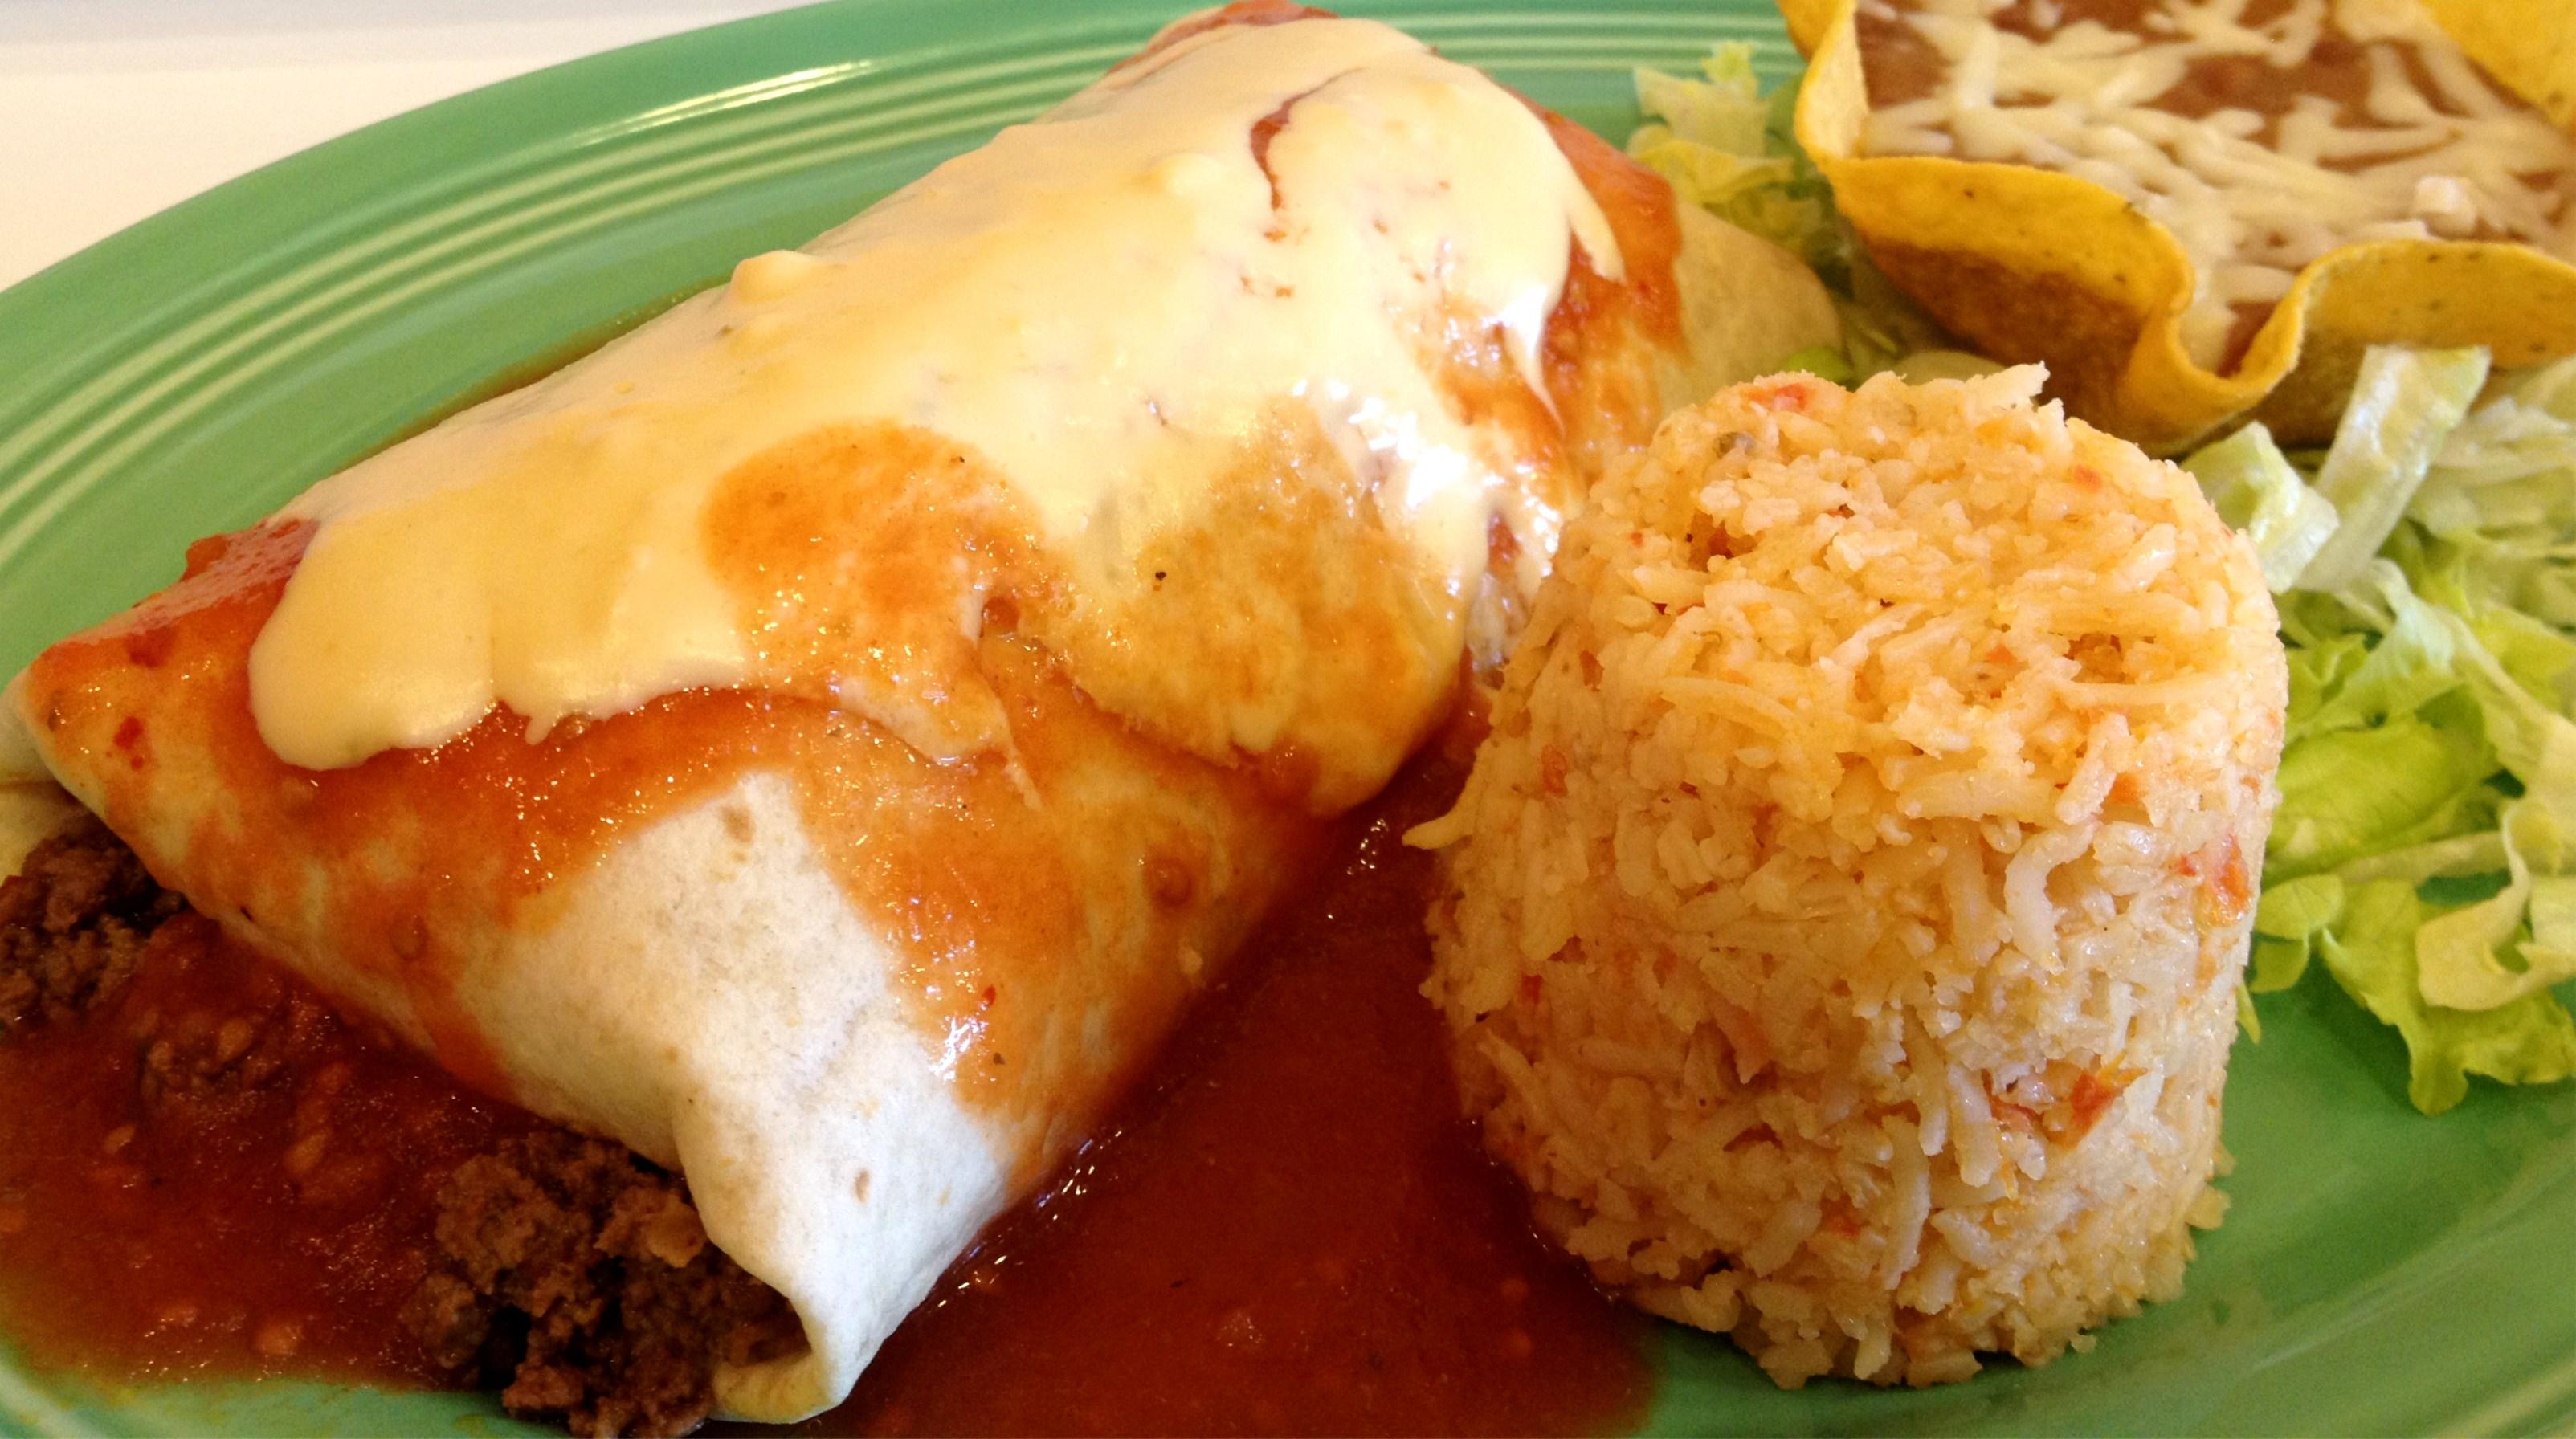 Burritos Steak Griled Chicken Carnitas Al Pastor for 12 Image